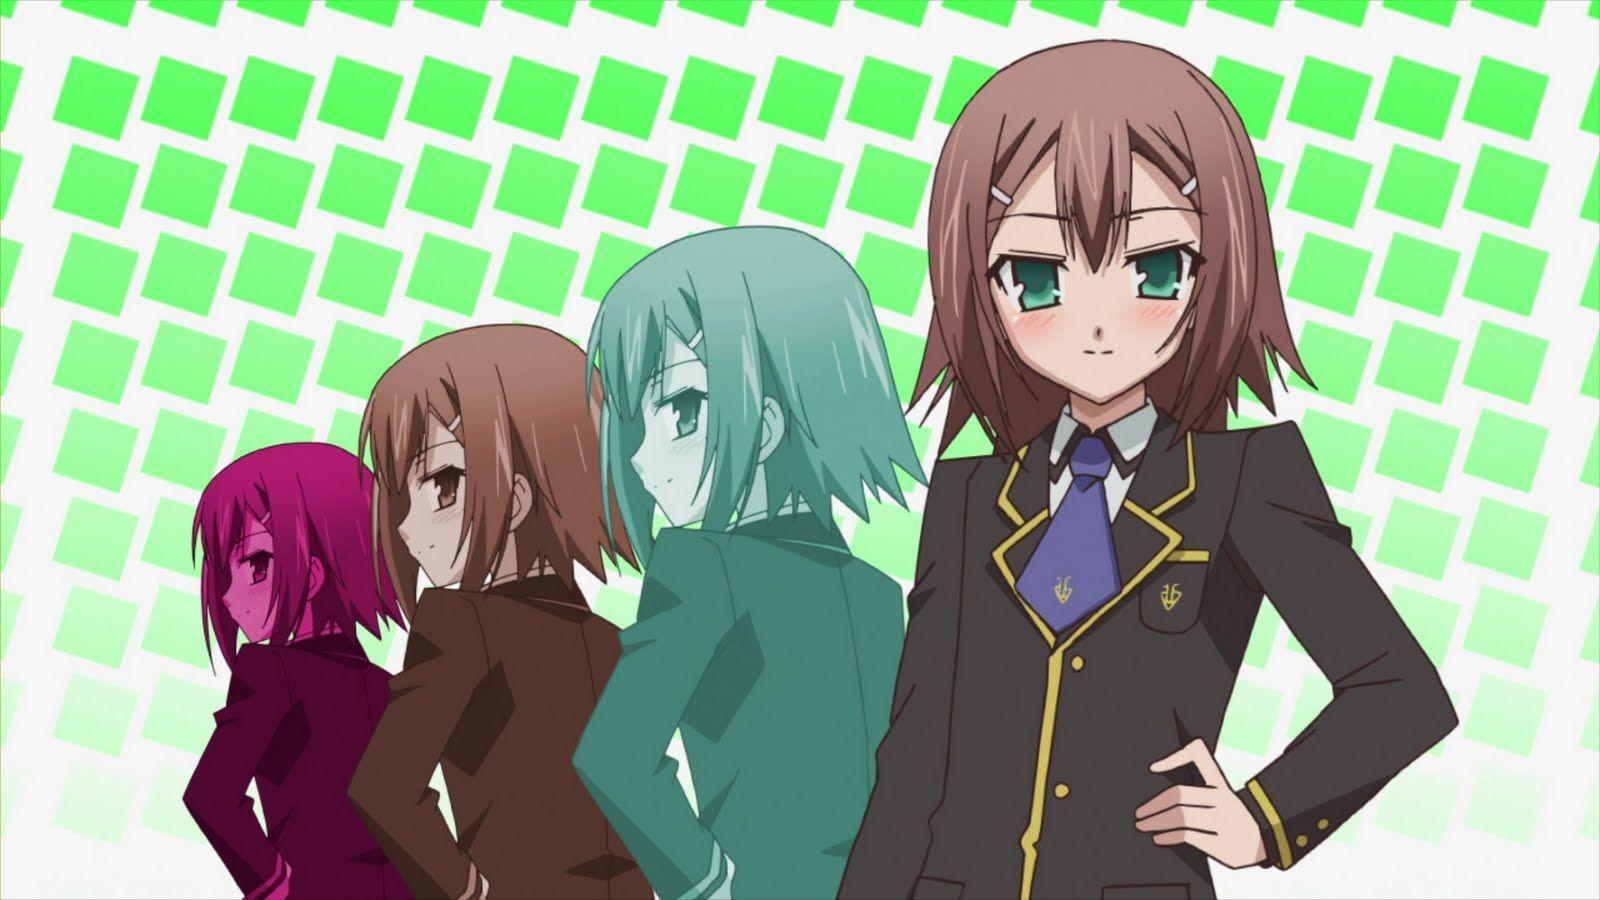 Baka No Test pin on fun/funny anime